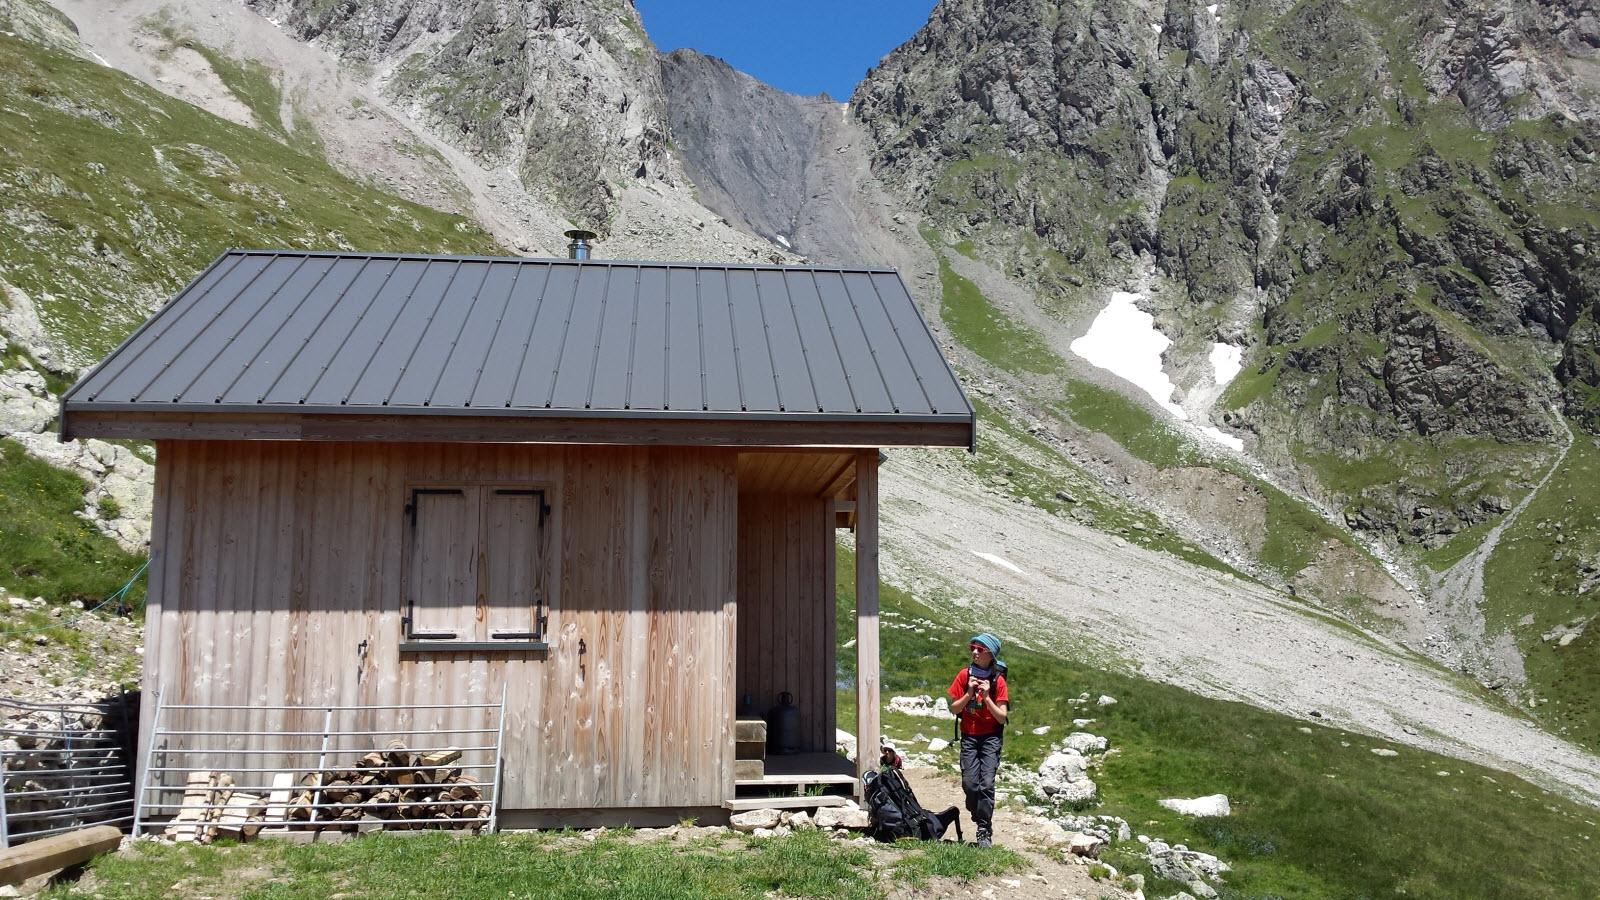 La Cabane du Ramu (2185 m)